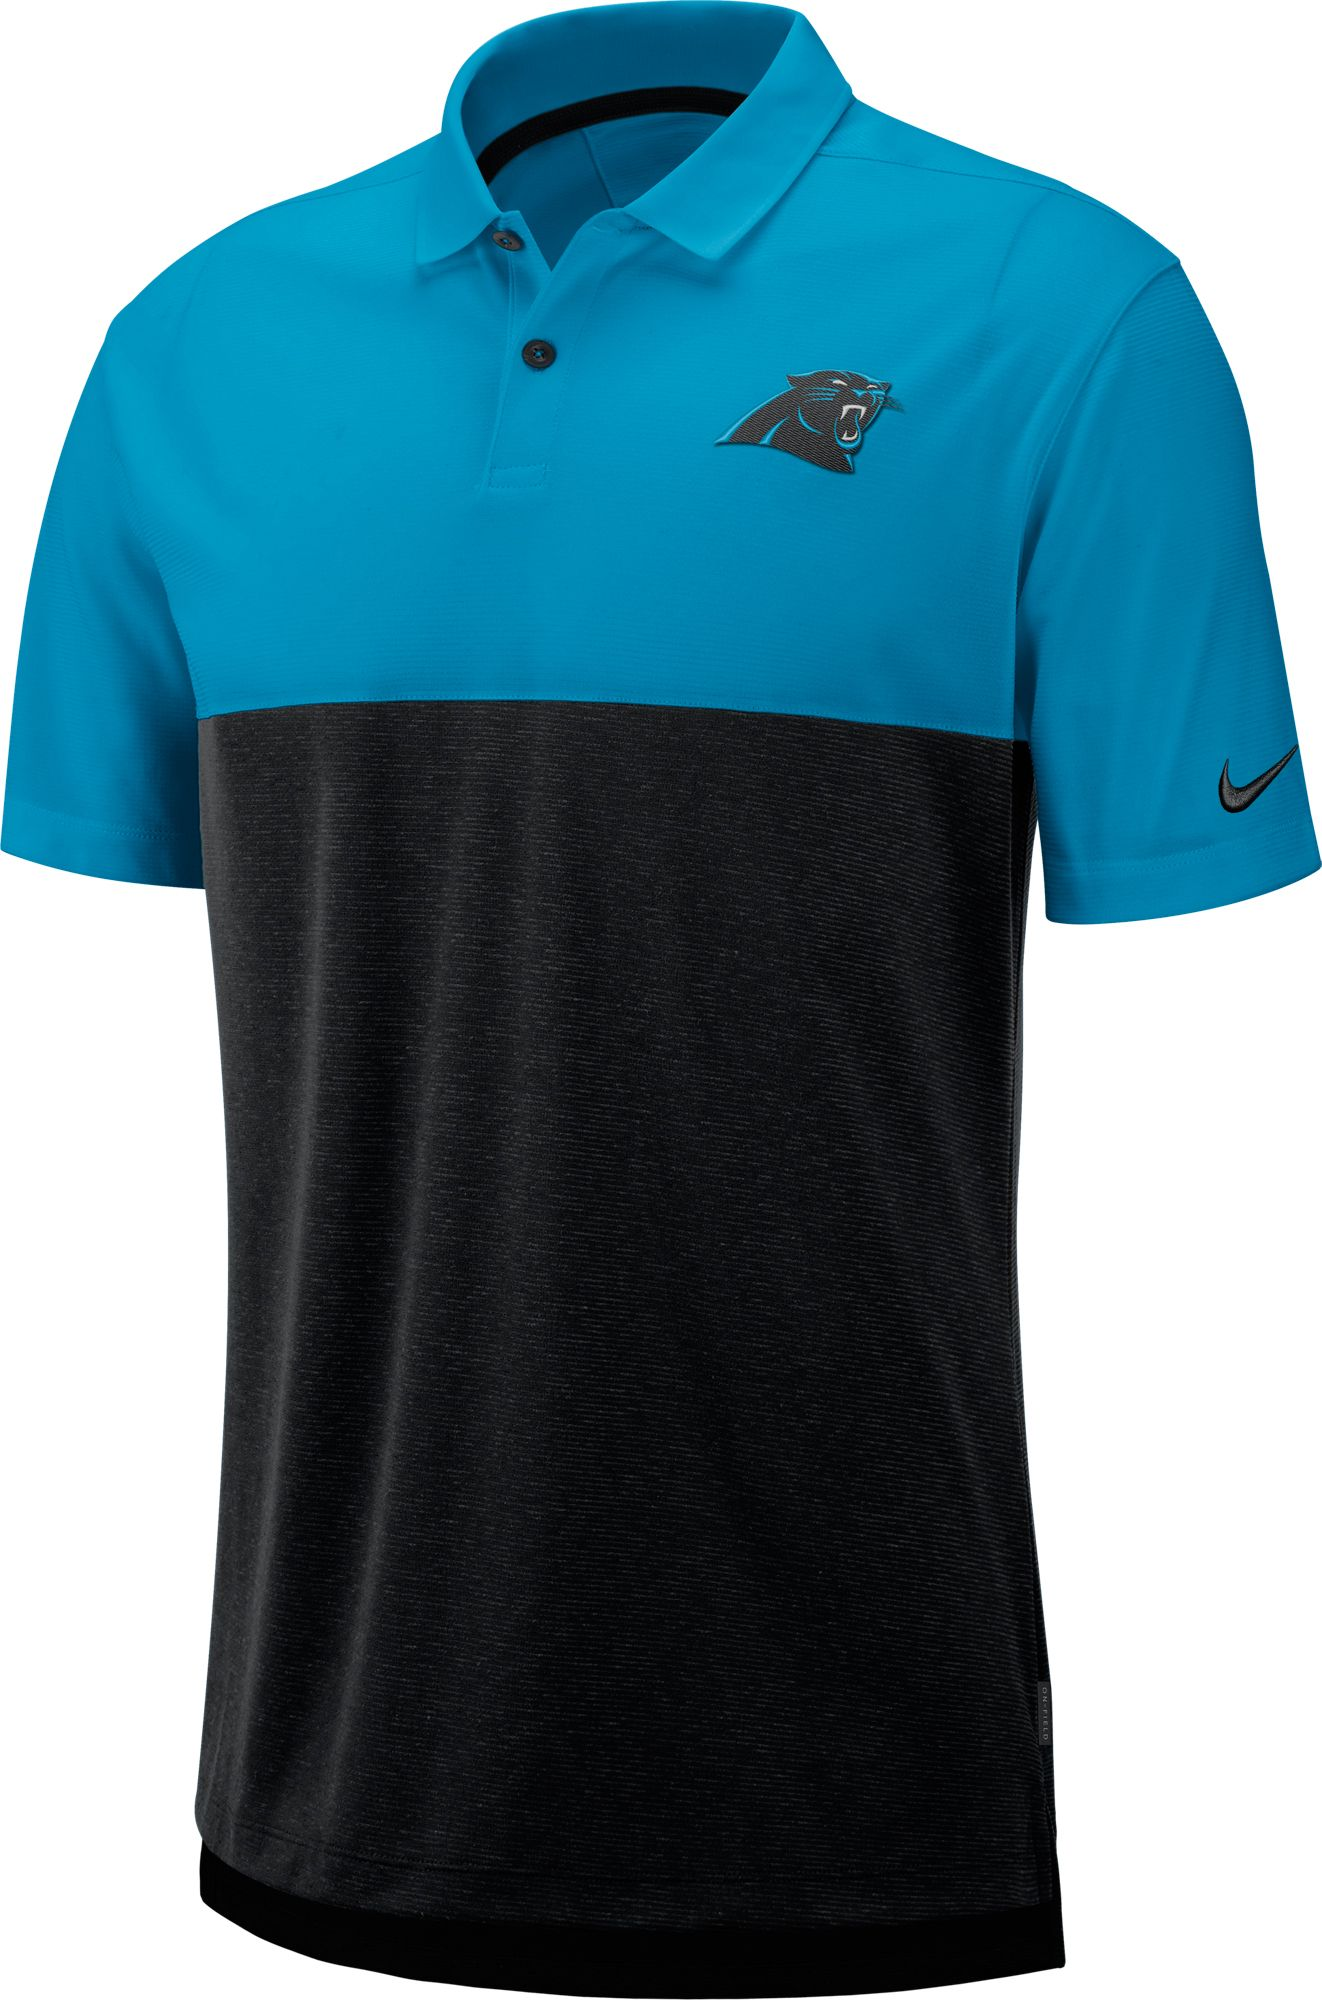 carolina panthers polo shirt